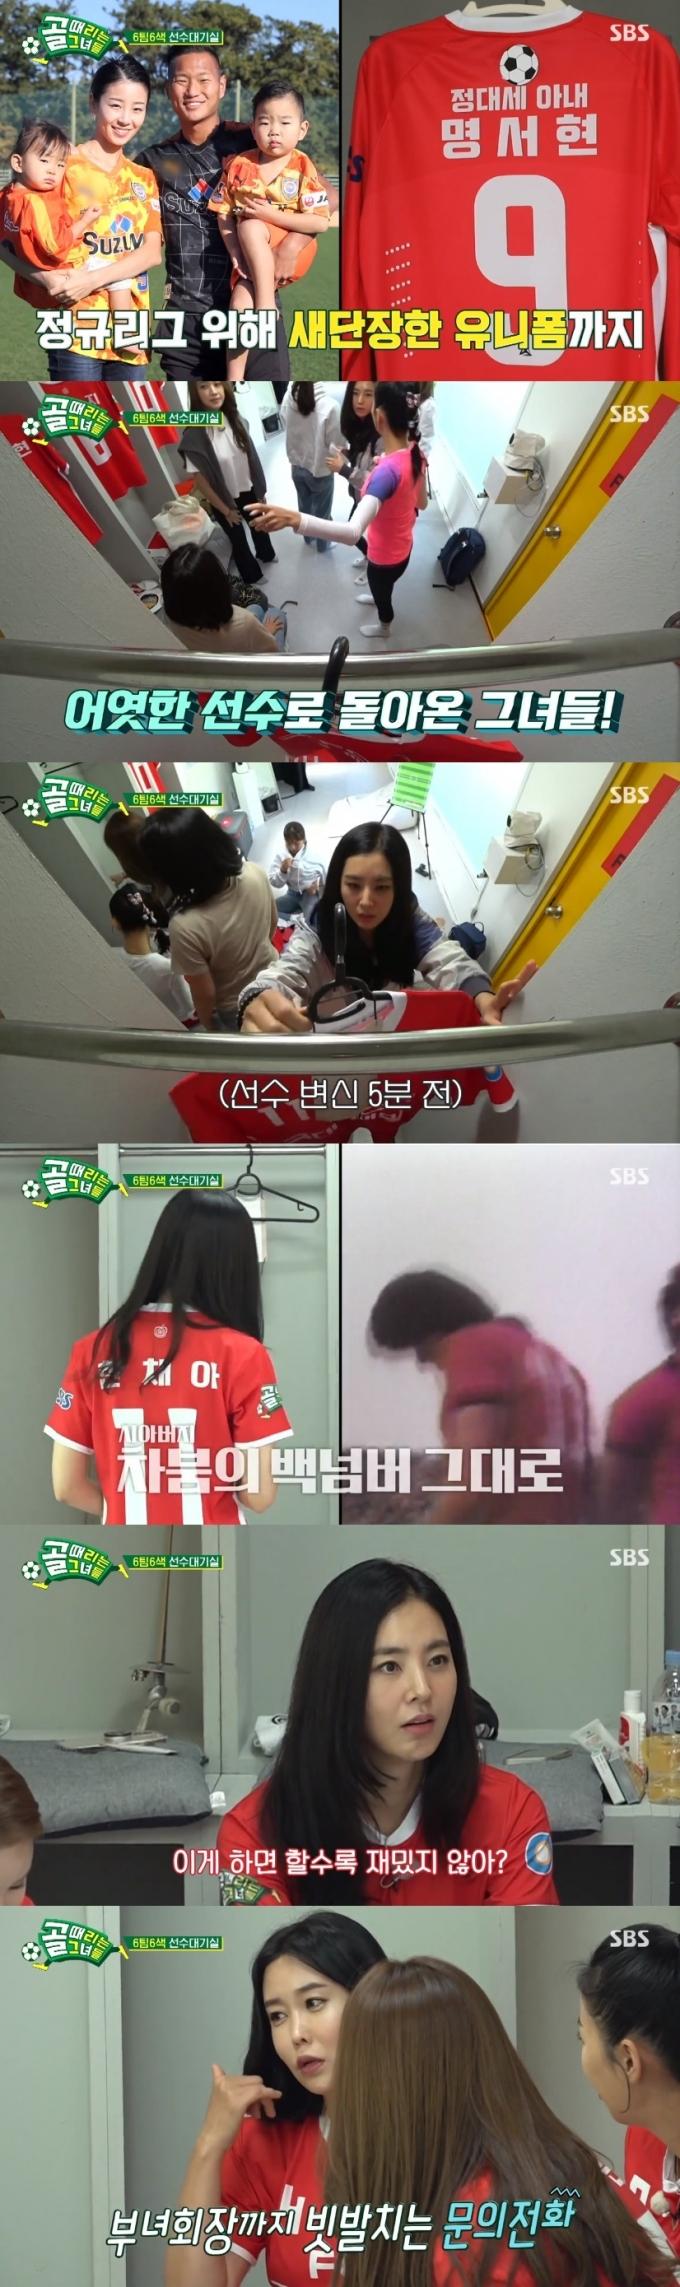 SBS '골 때리는 그녀들' 캡처 © 뉴스1